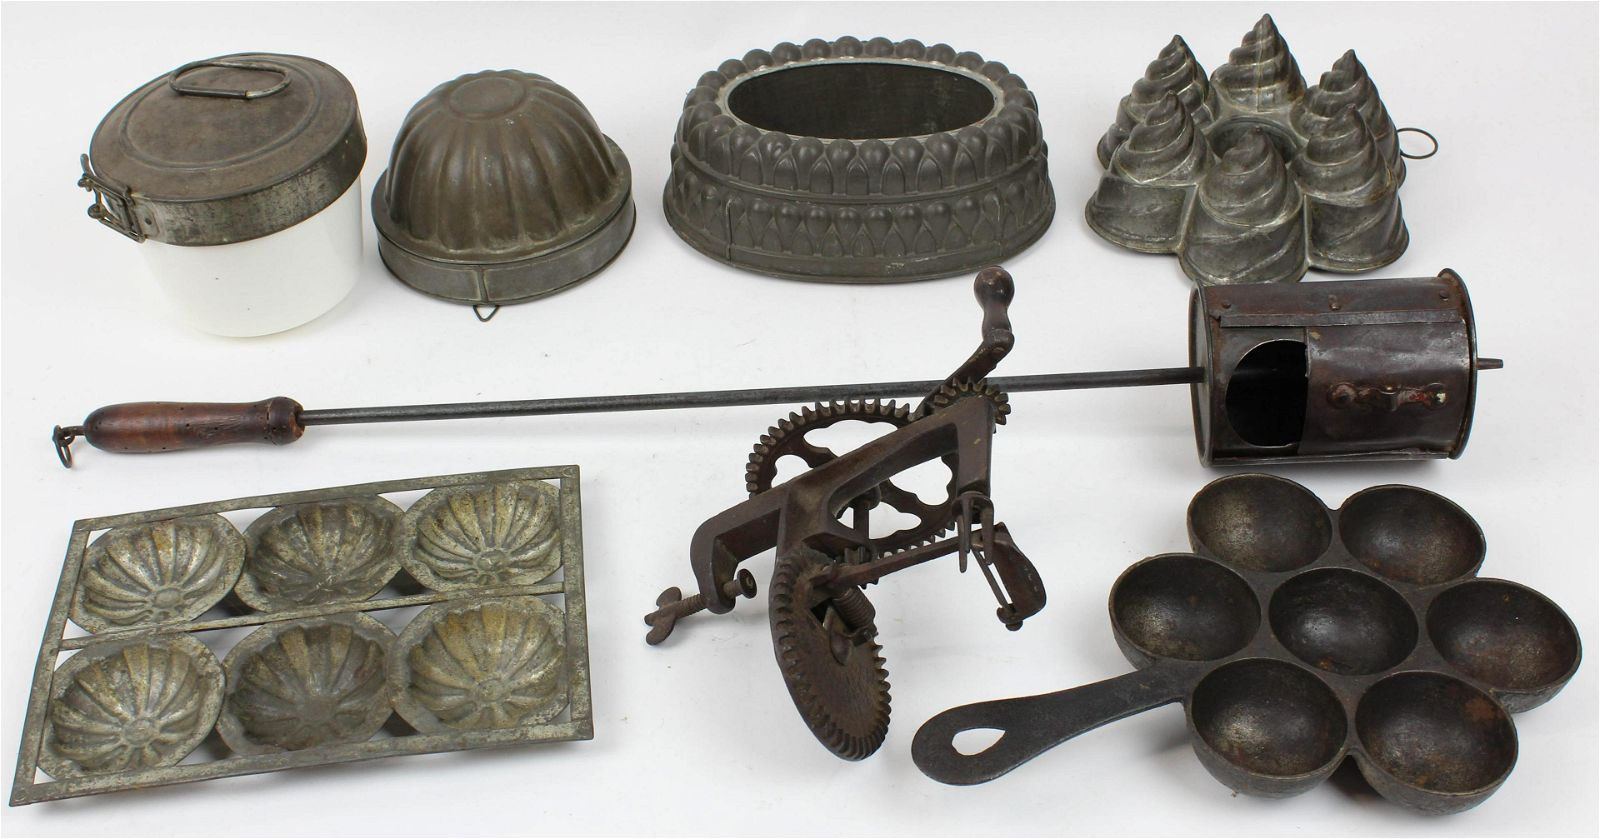 8 pcs of Early Tin Kitchenware